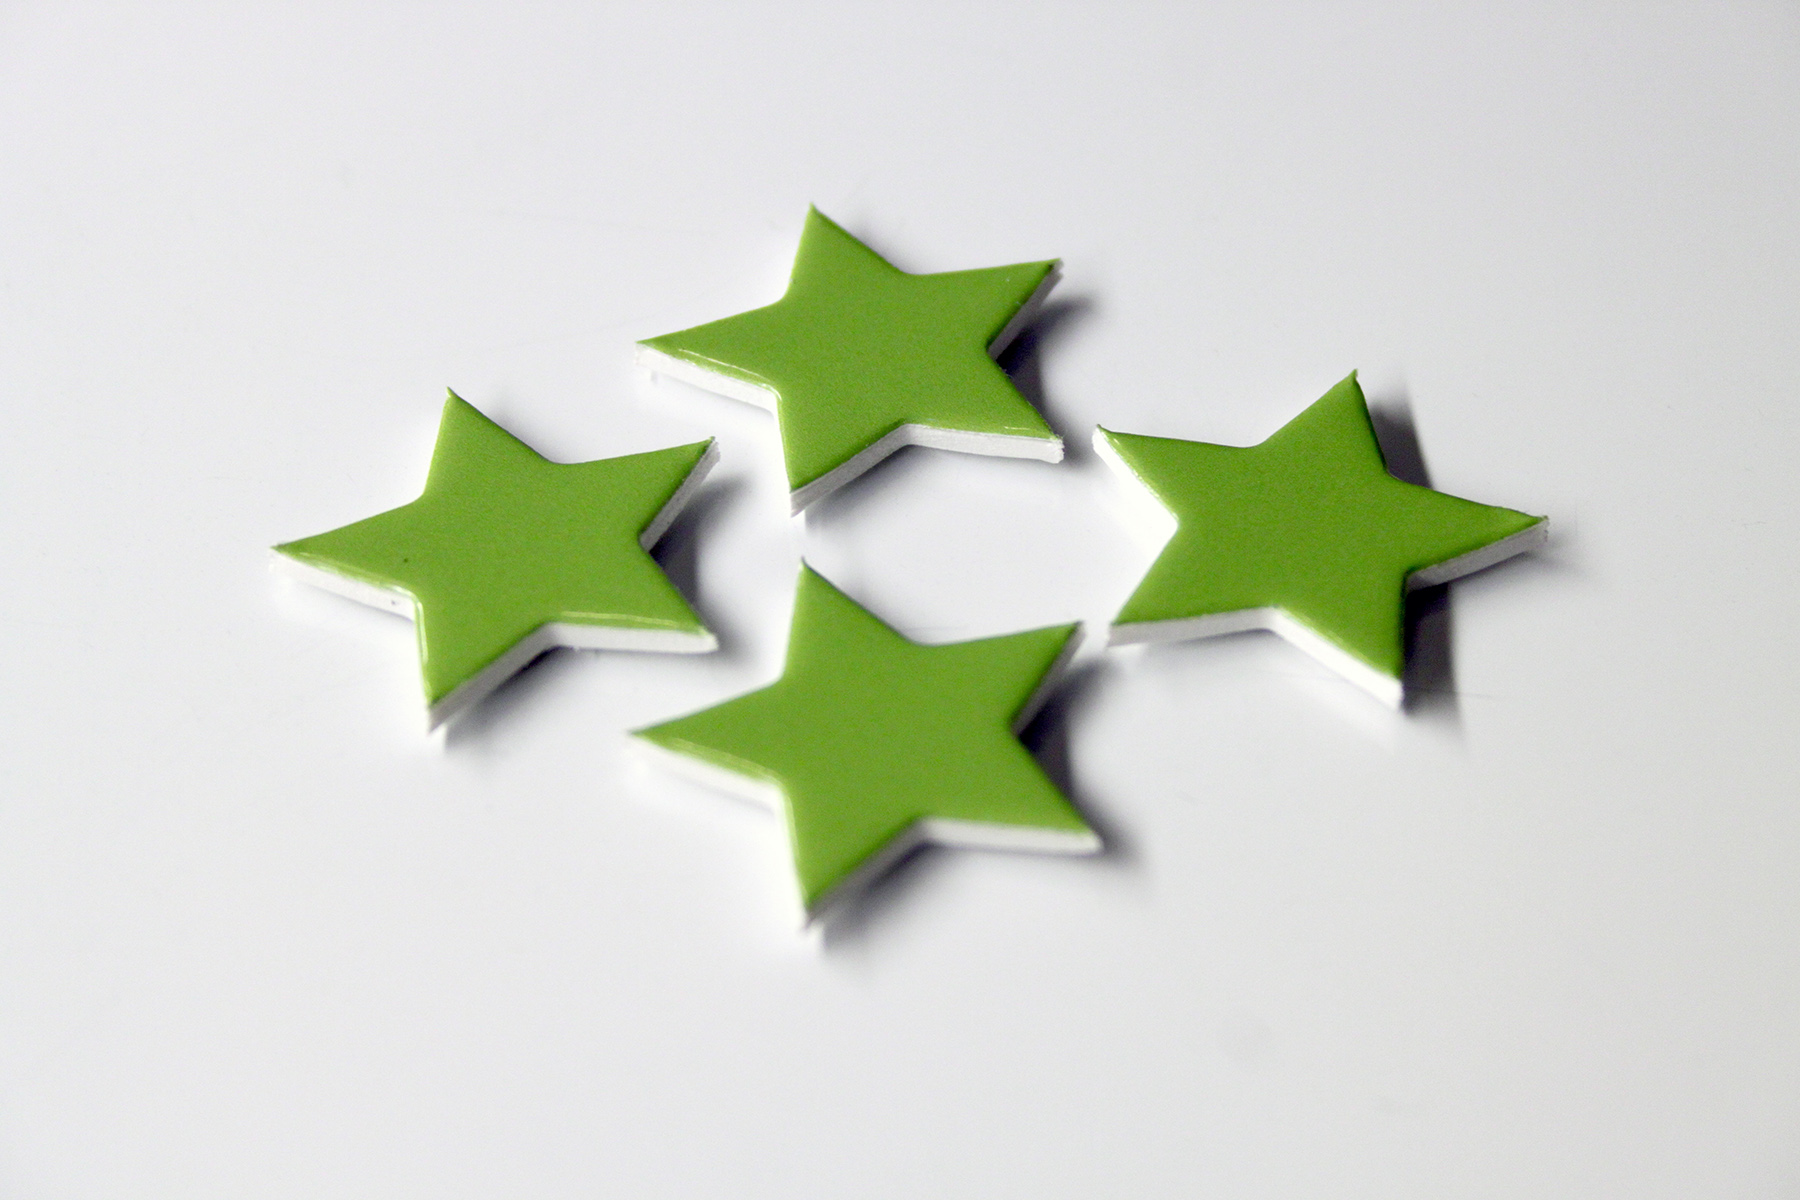 green star custom shaped magnets